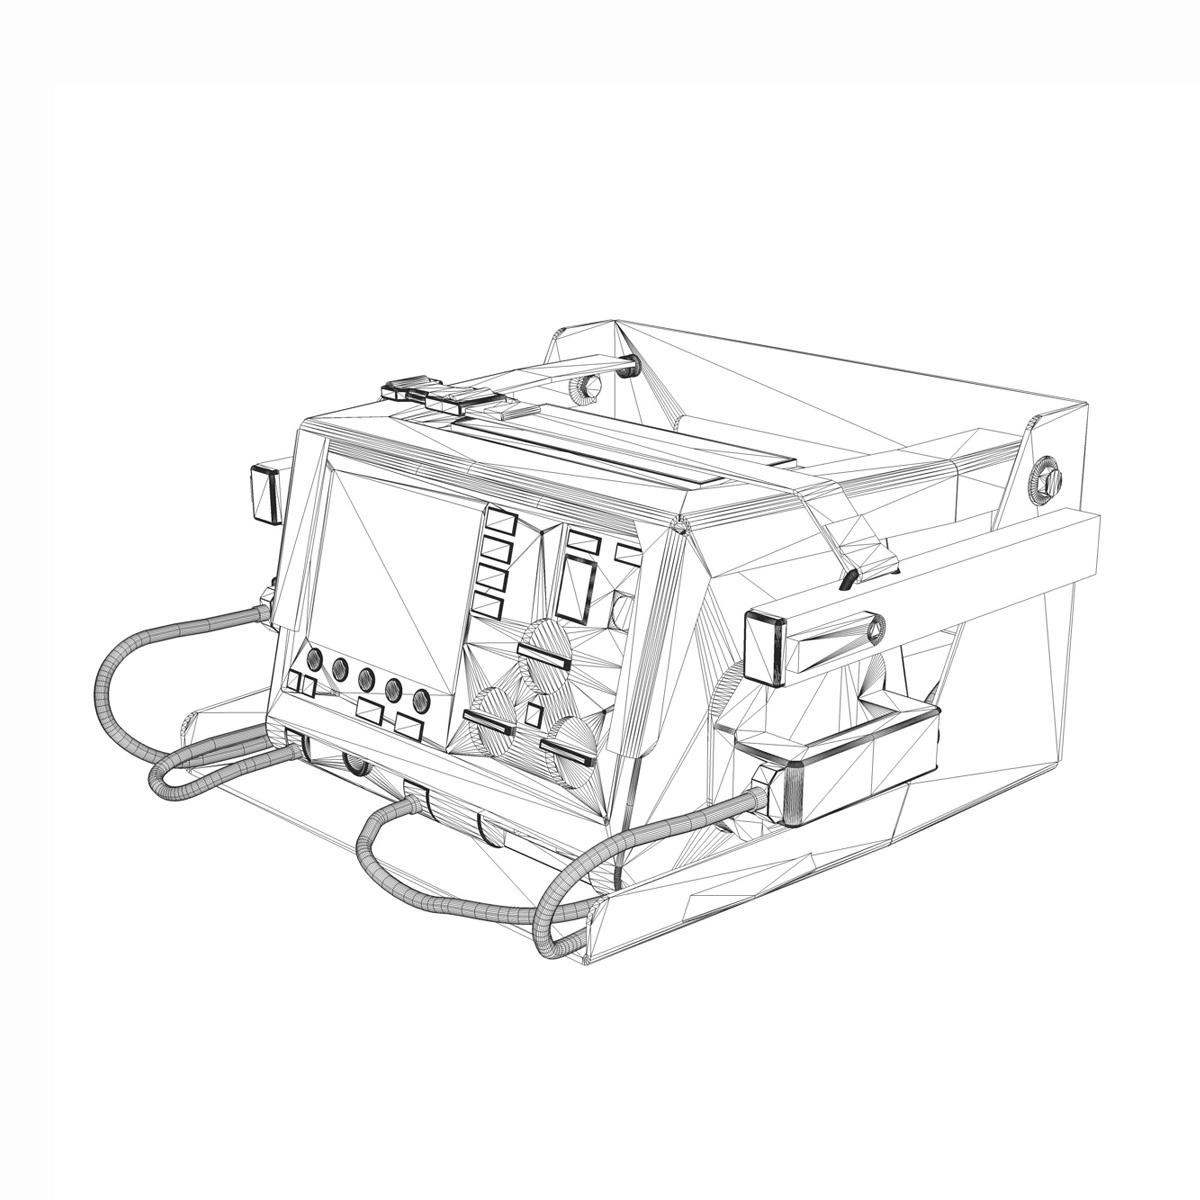 defibrillator 3d model 3ds c4d lwo obj 264216